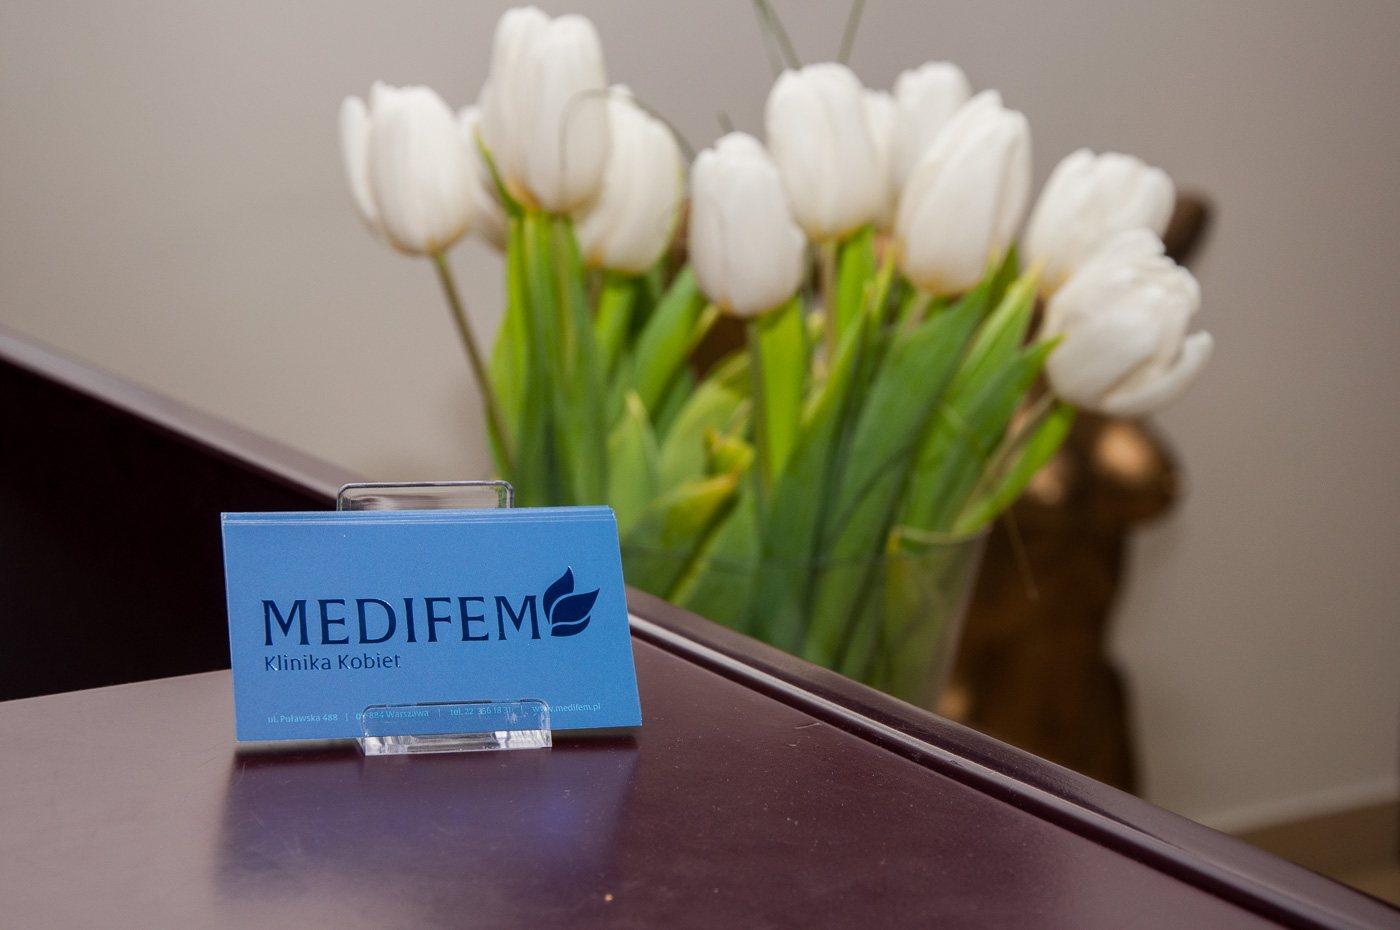 Medifem gallery - picture 4